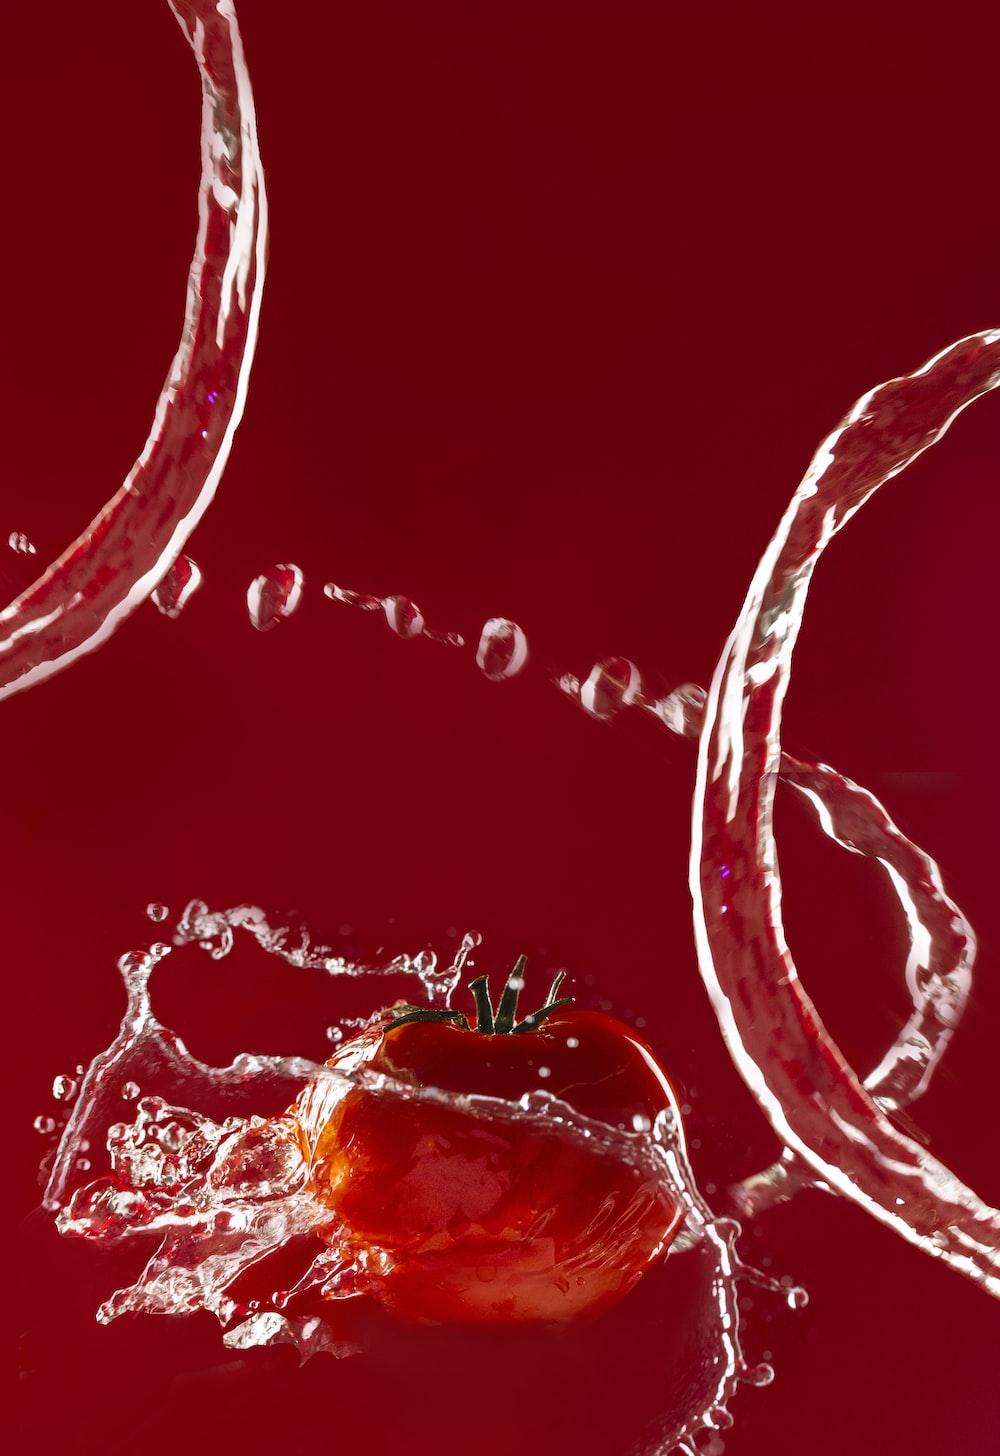 Tomato | HD photo by Hessam Hojati (@hessamhoajti) on Unsplash